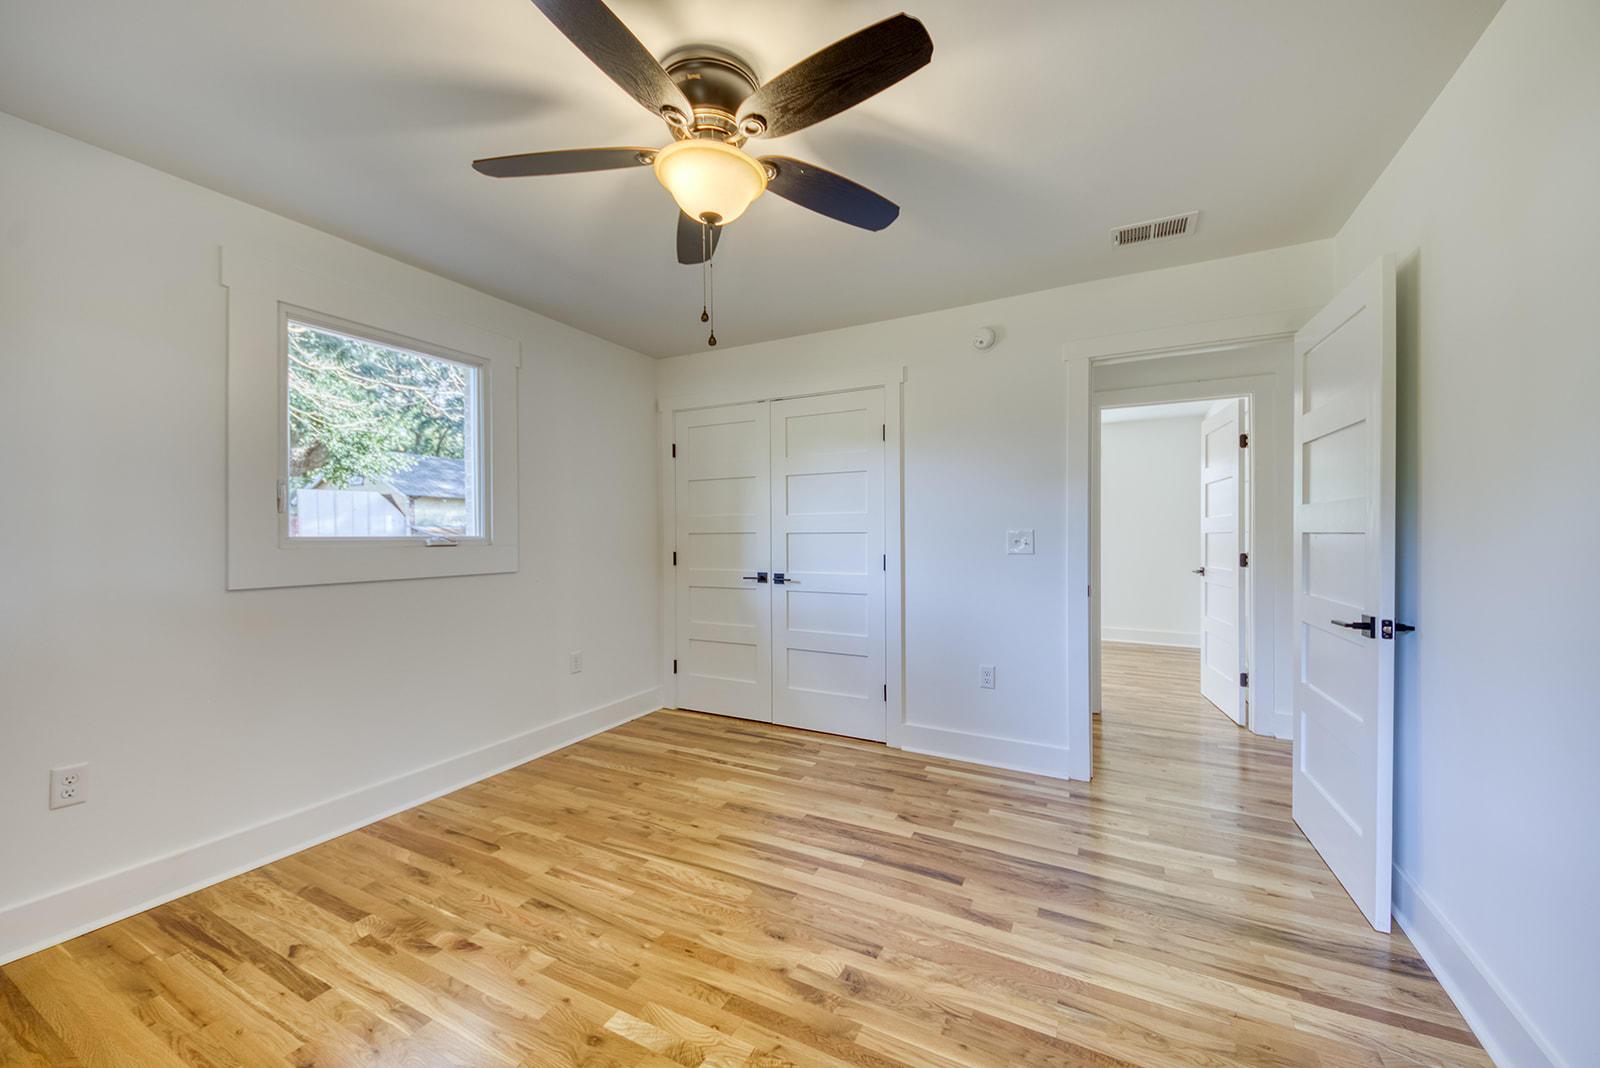 Bay View Acres Homes For Sale - 265 Coleman, Mount Pleasant, SC - 58